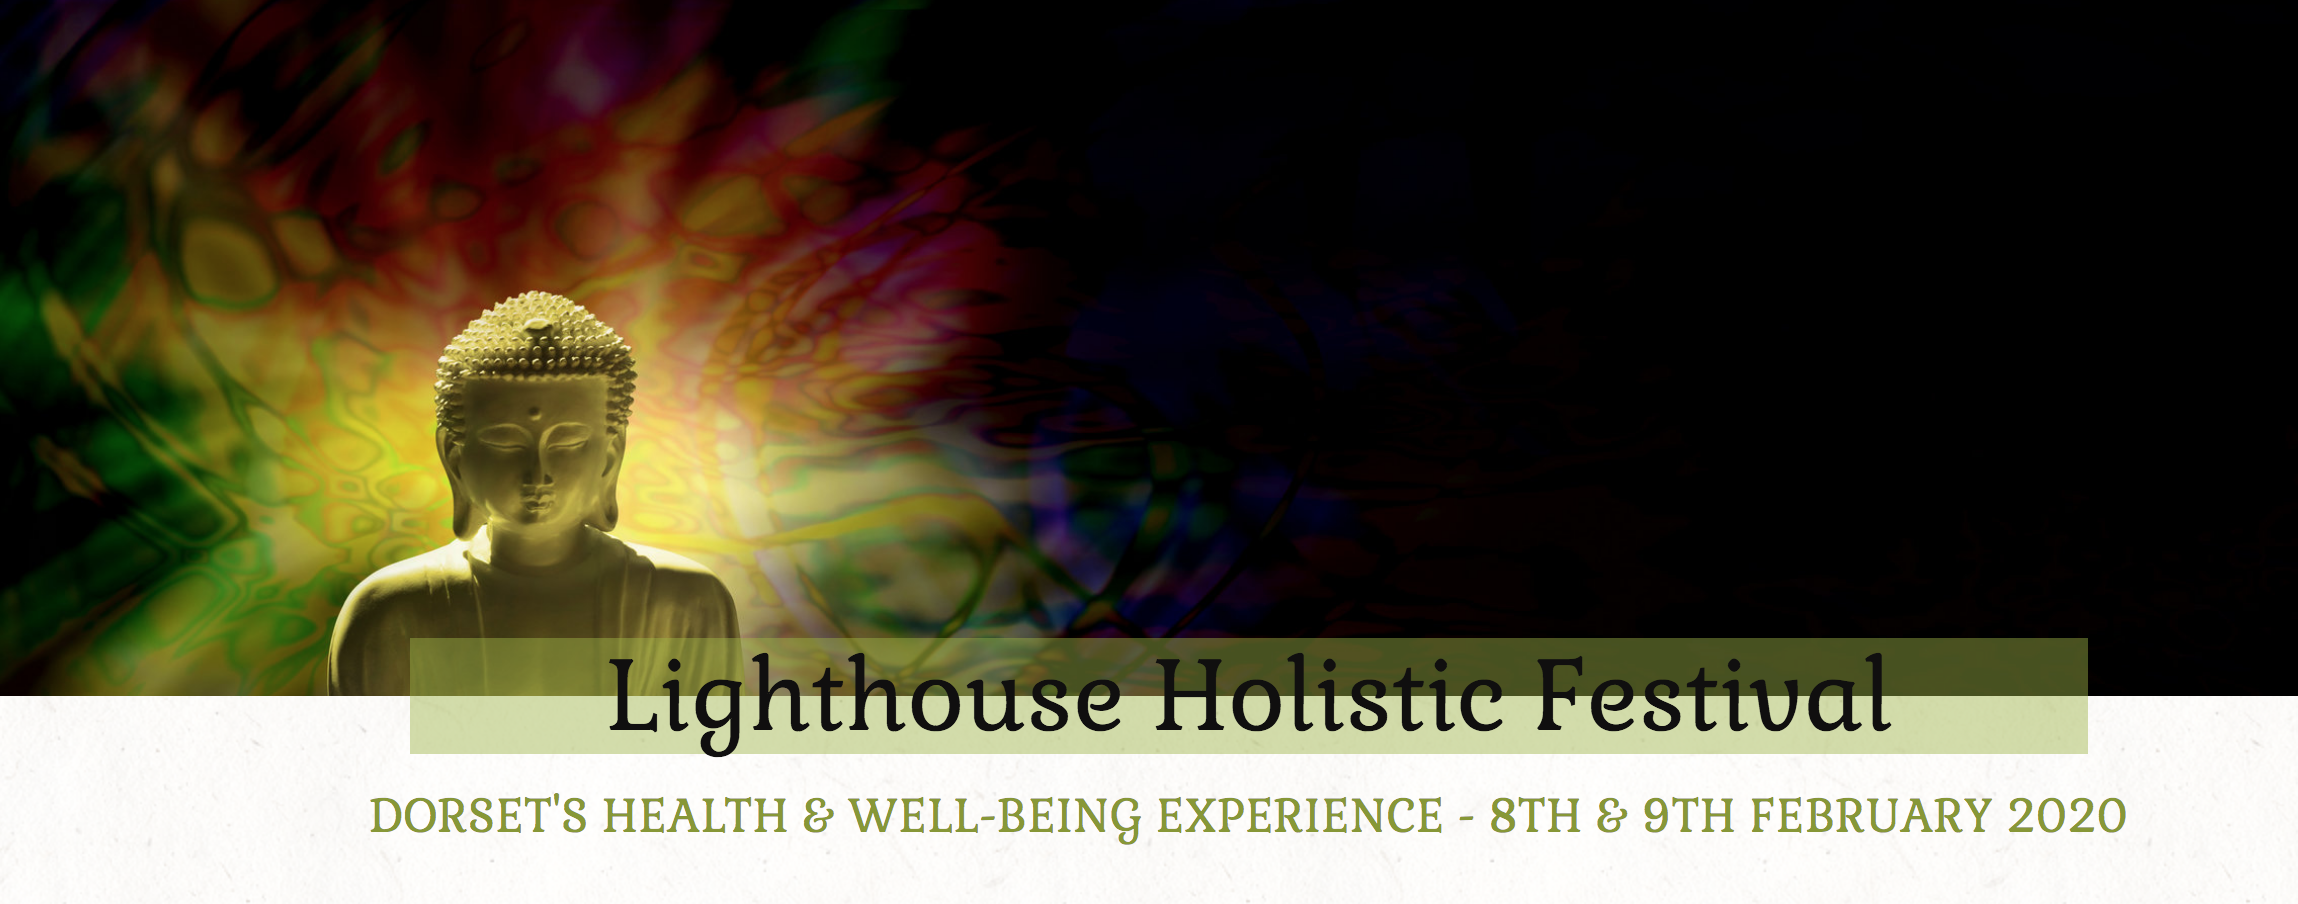 Lighthouse Holistic Festival